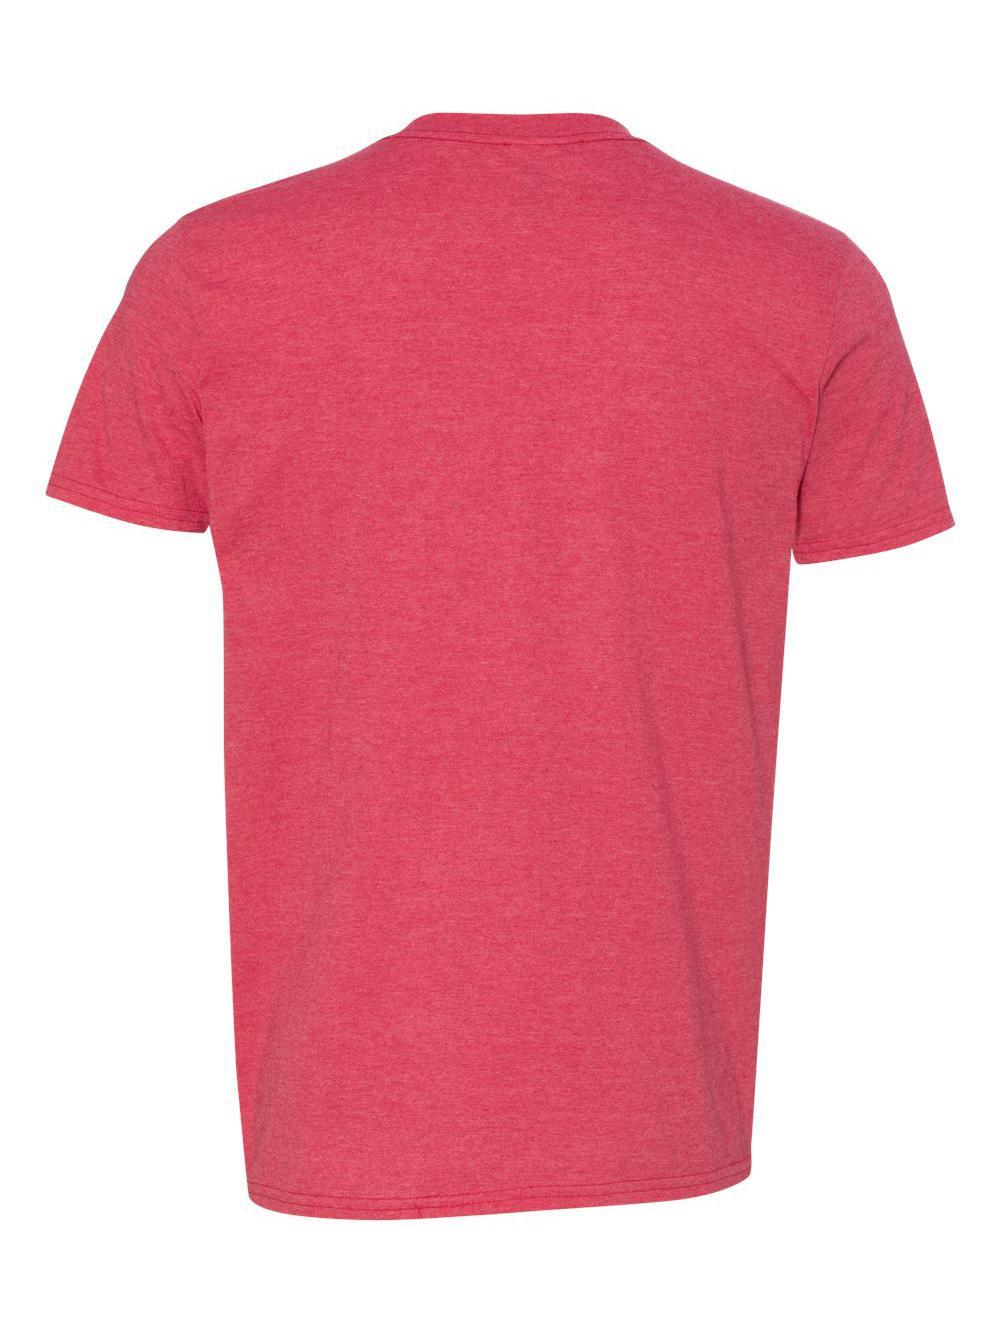 Gildan-Softstyle-T-Shirt-64000 thumbnail 94